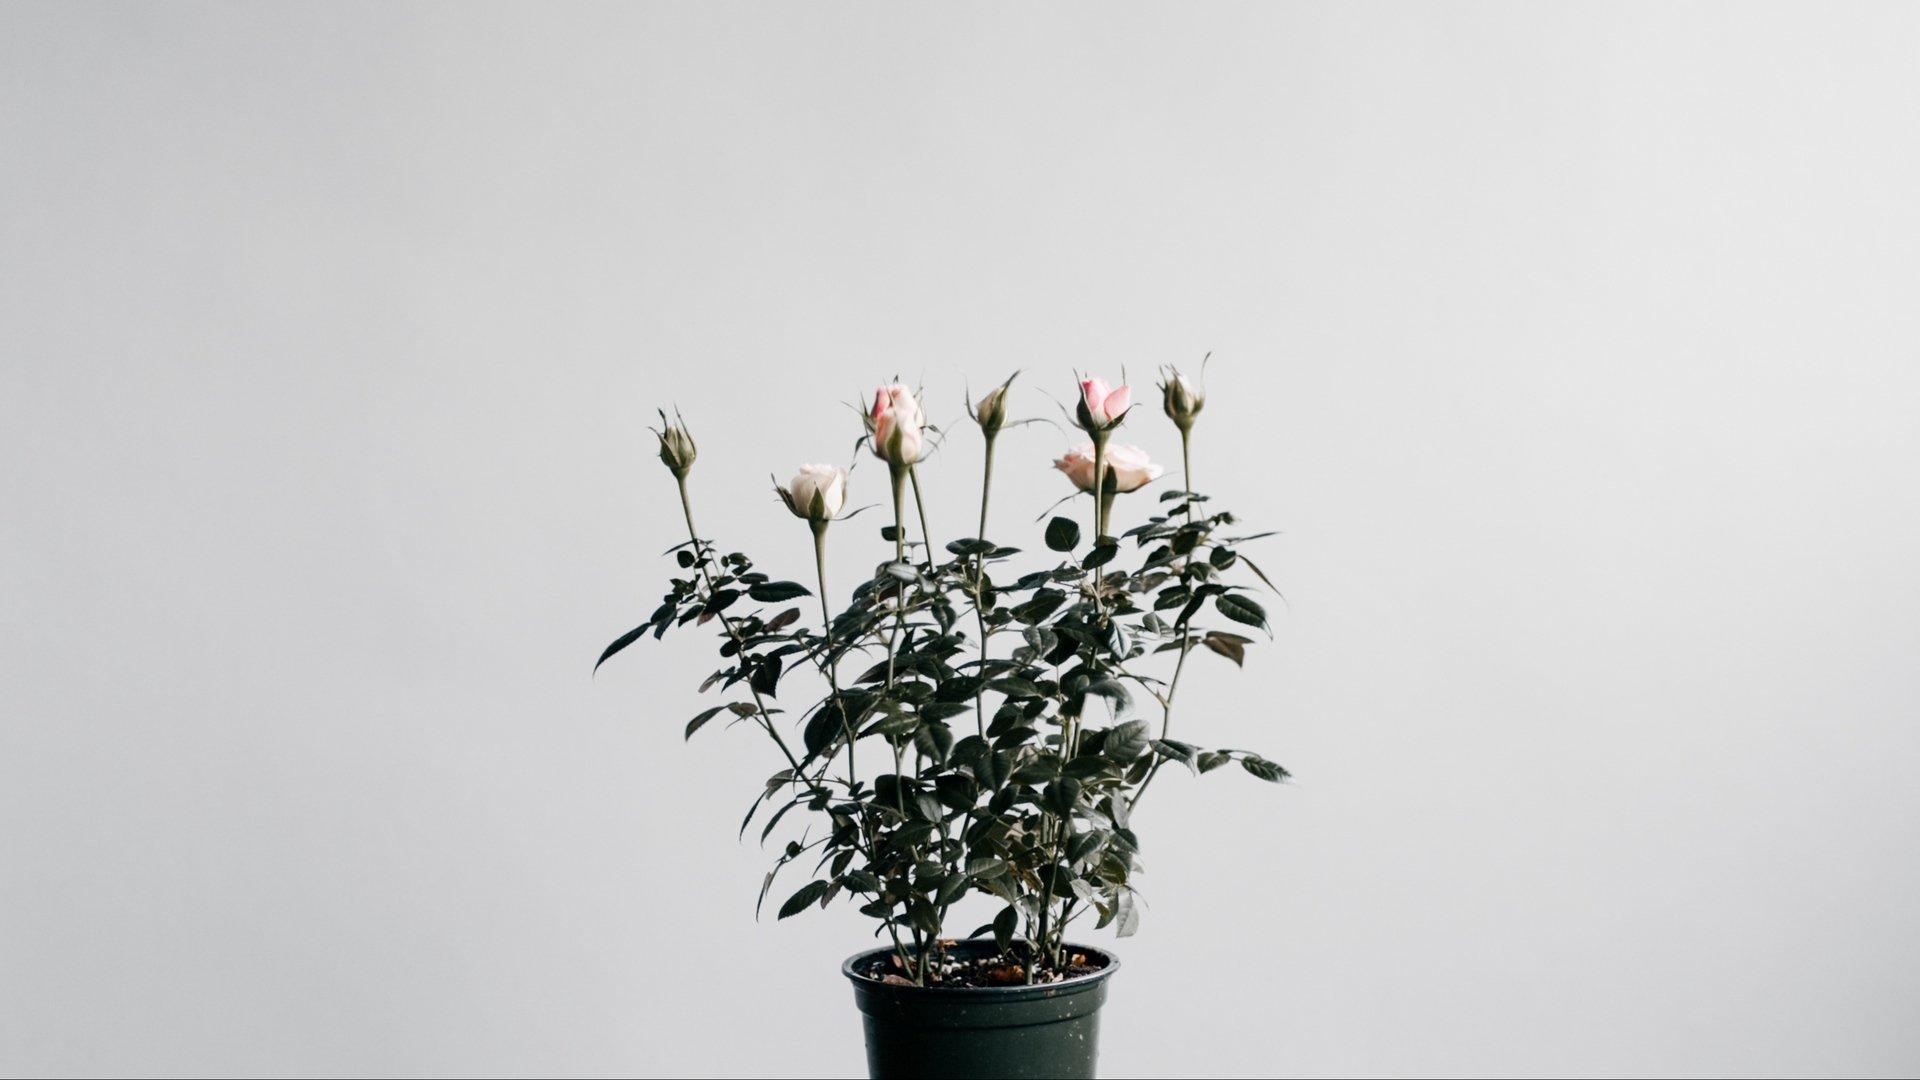 24 Minimalist Aesthetic Wallpapers - WallpaperBoat